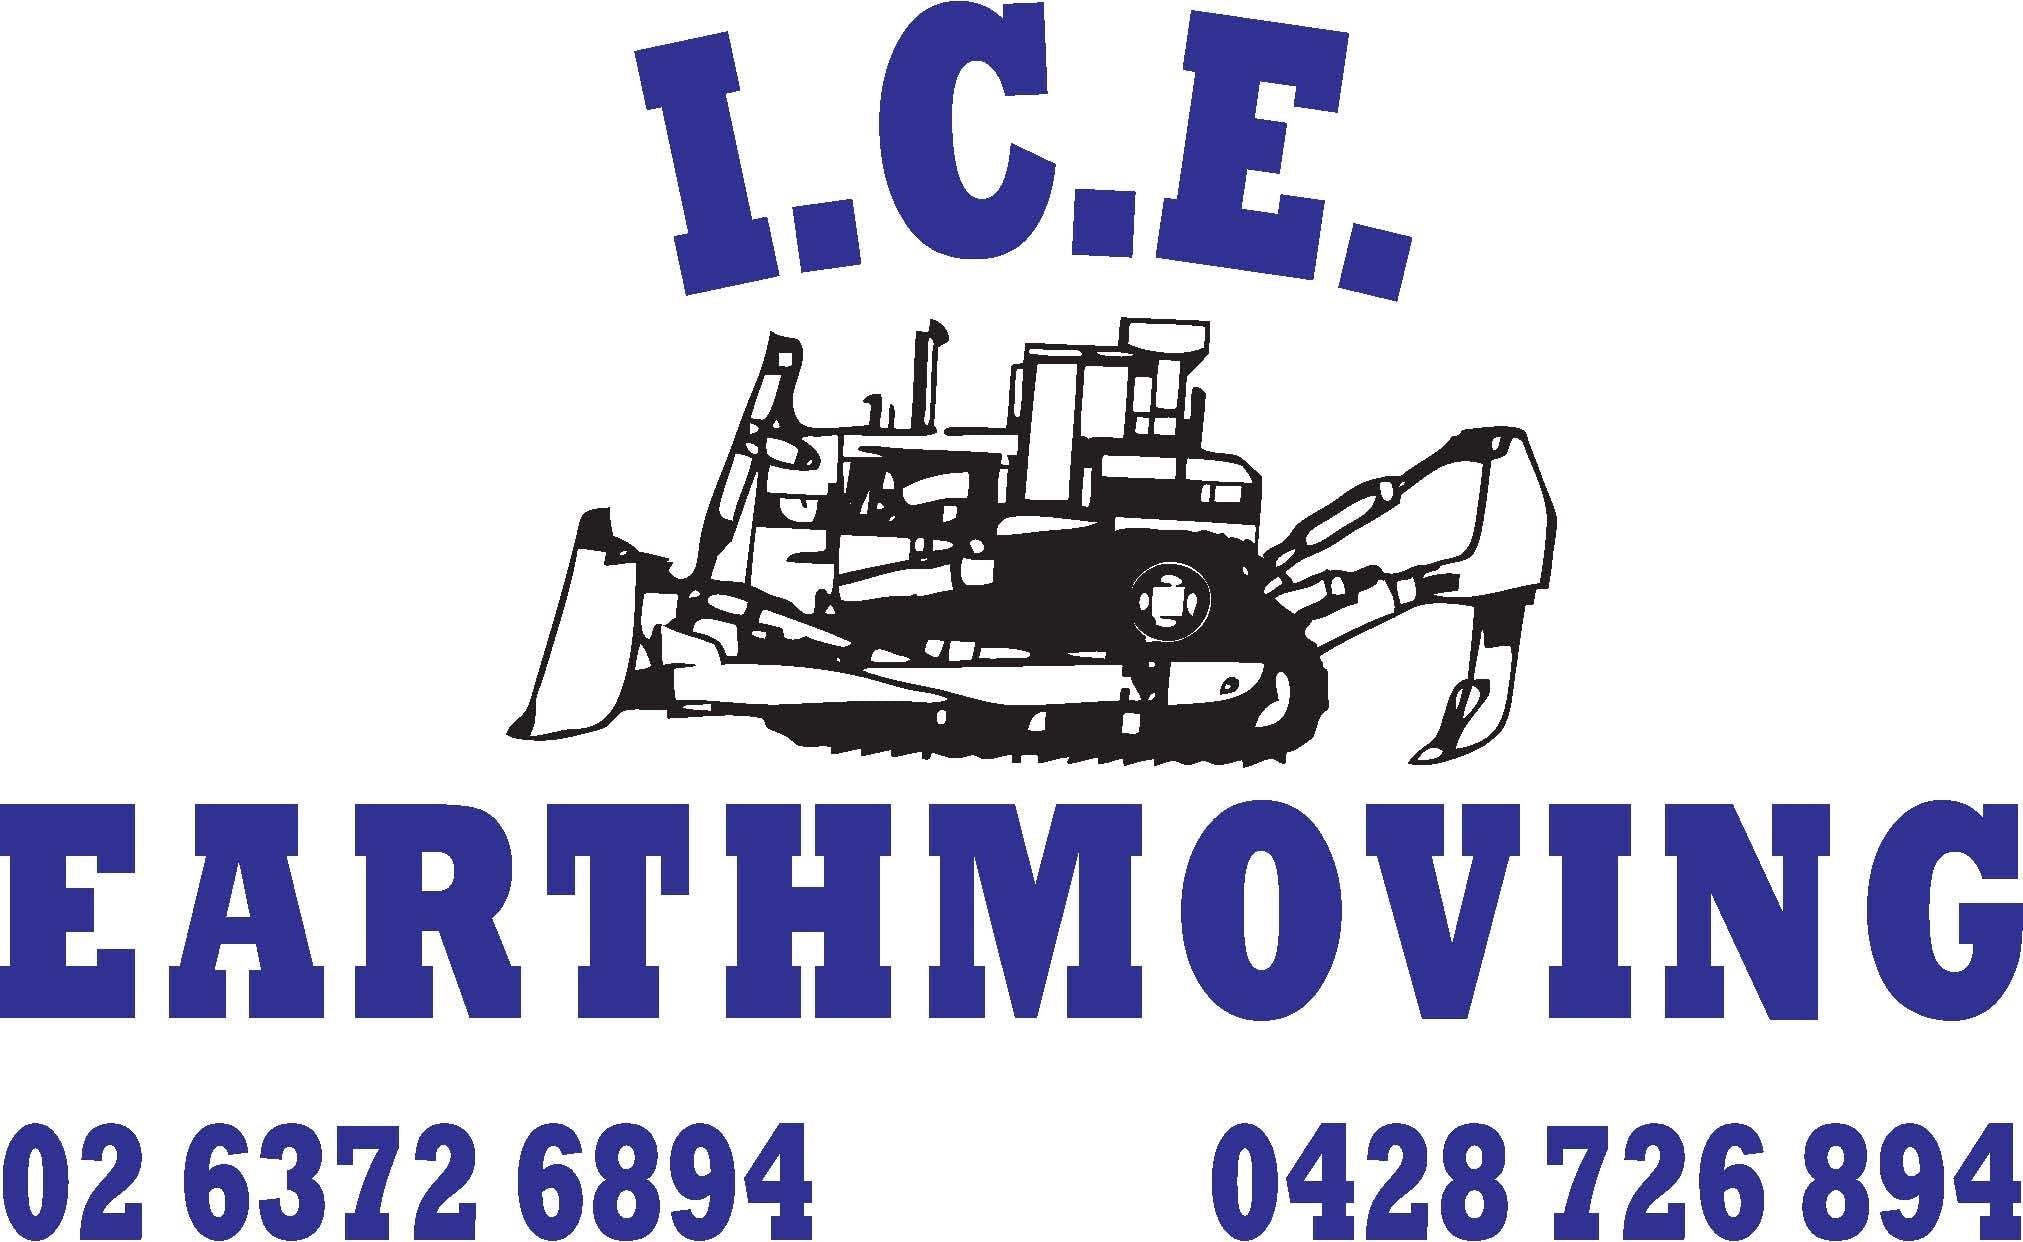 ICE Earthmoving Pty Ltd